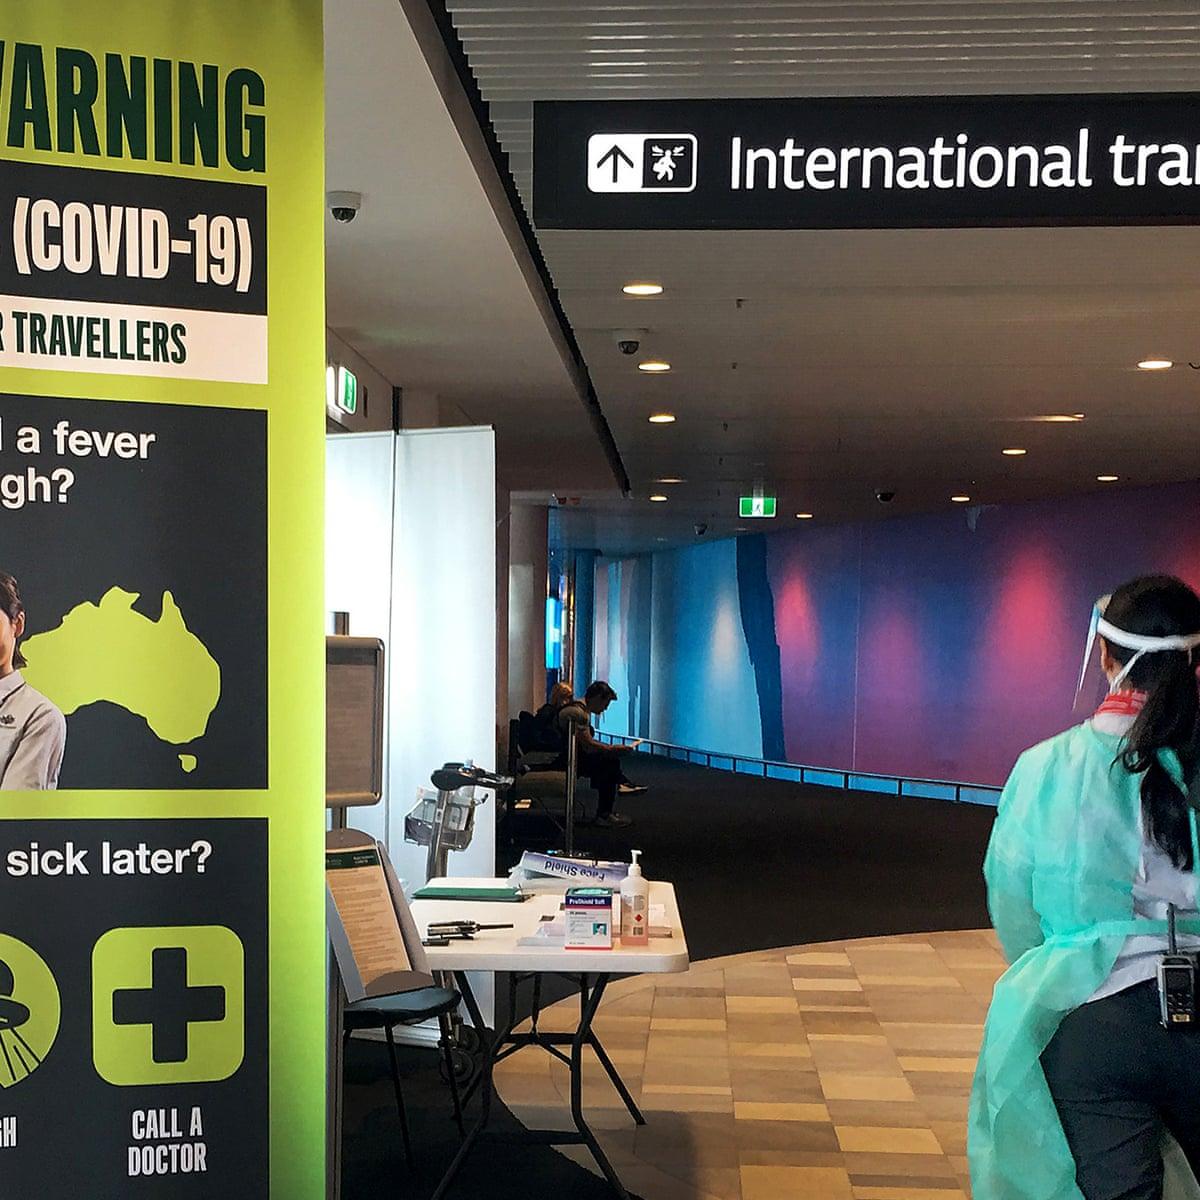 How Australia Will Enforce Coronavirus Self Isolation Rules For Overseas Arrivals Coronavirus Outbreak The Guardian